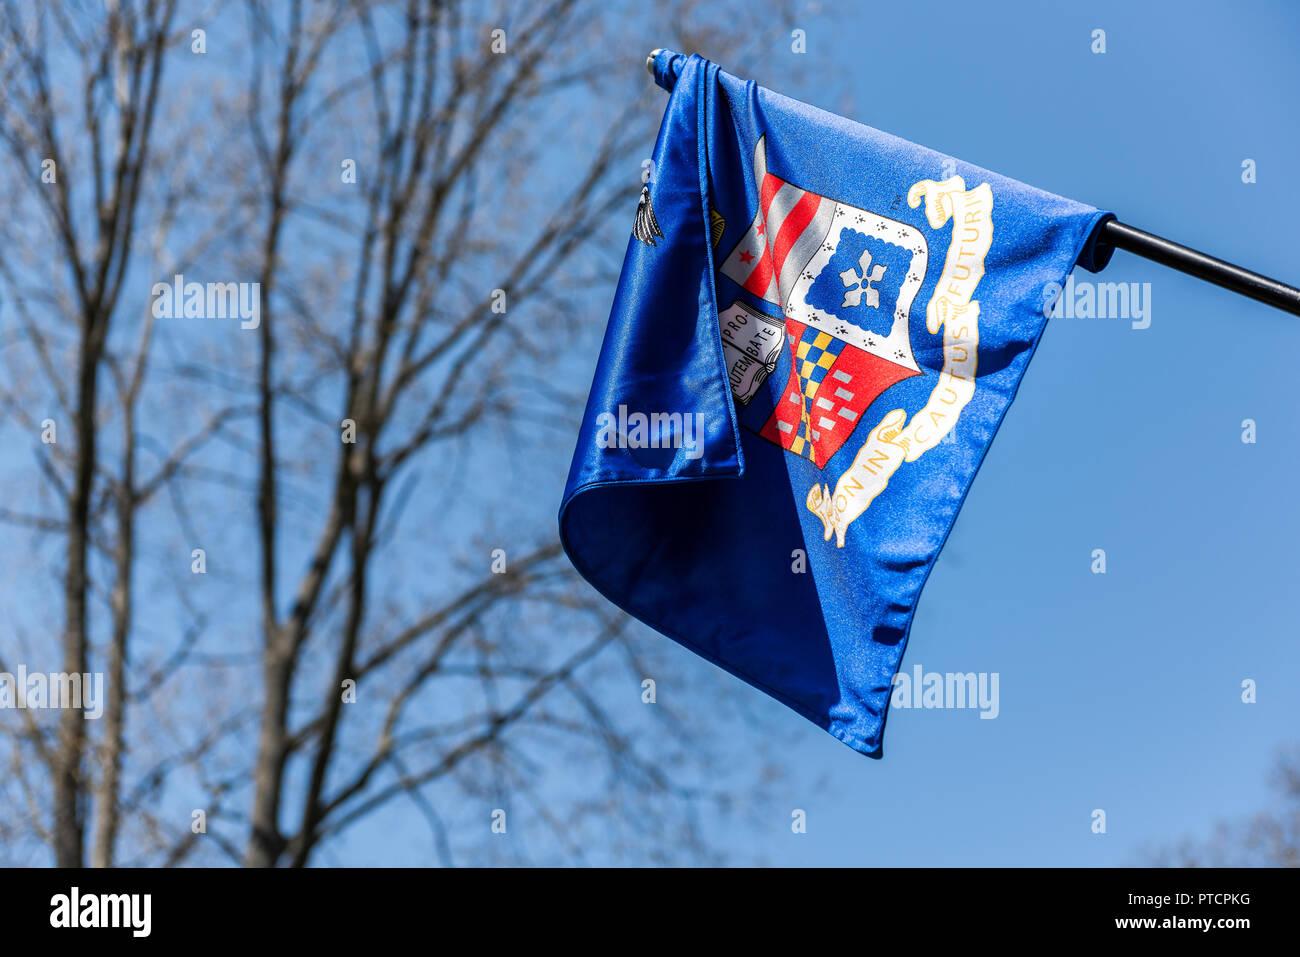 Lexington, USA - April 18, 2018: Washington and Lee University flag in Virginia closeup isolated against blue sky with sign motto for Non incautus fut - Stock Image